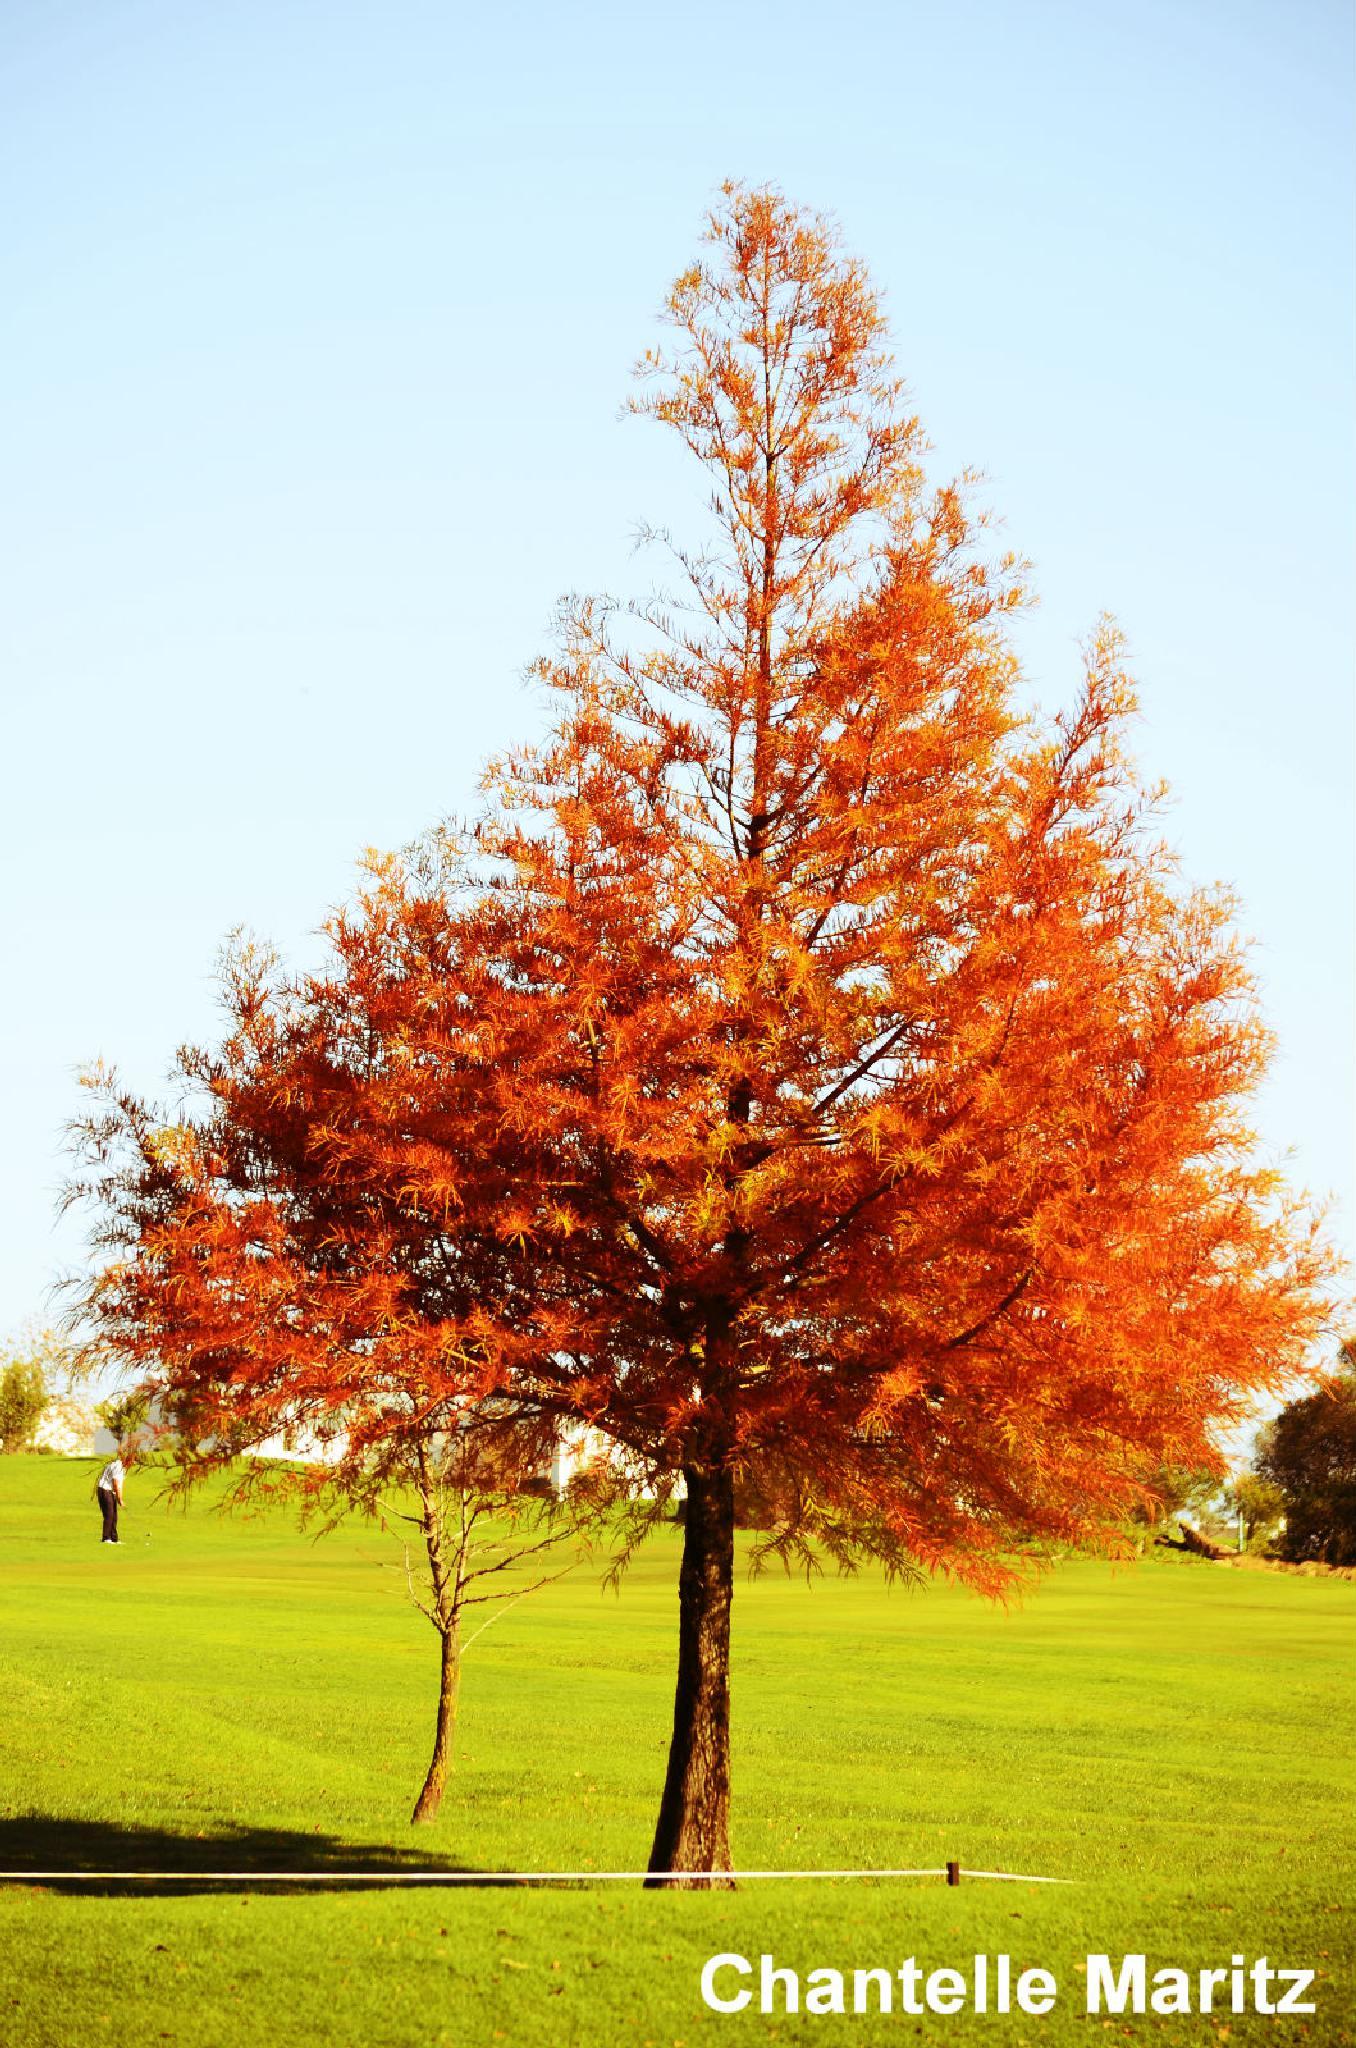 Love those orange trees! by Chantelle Maritz